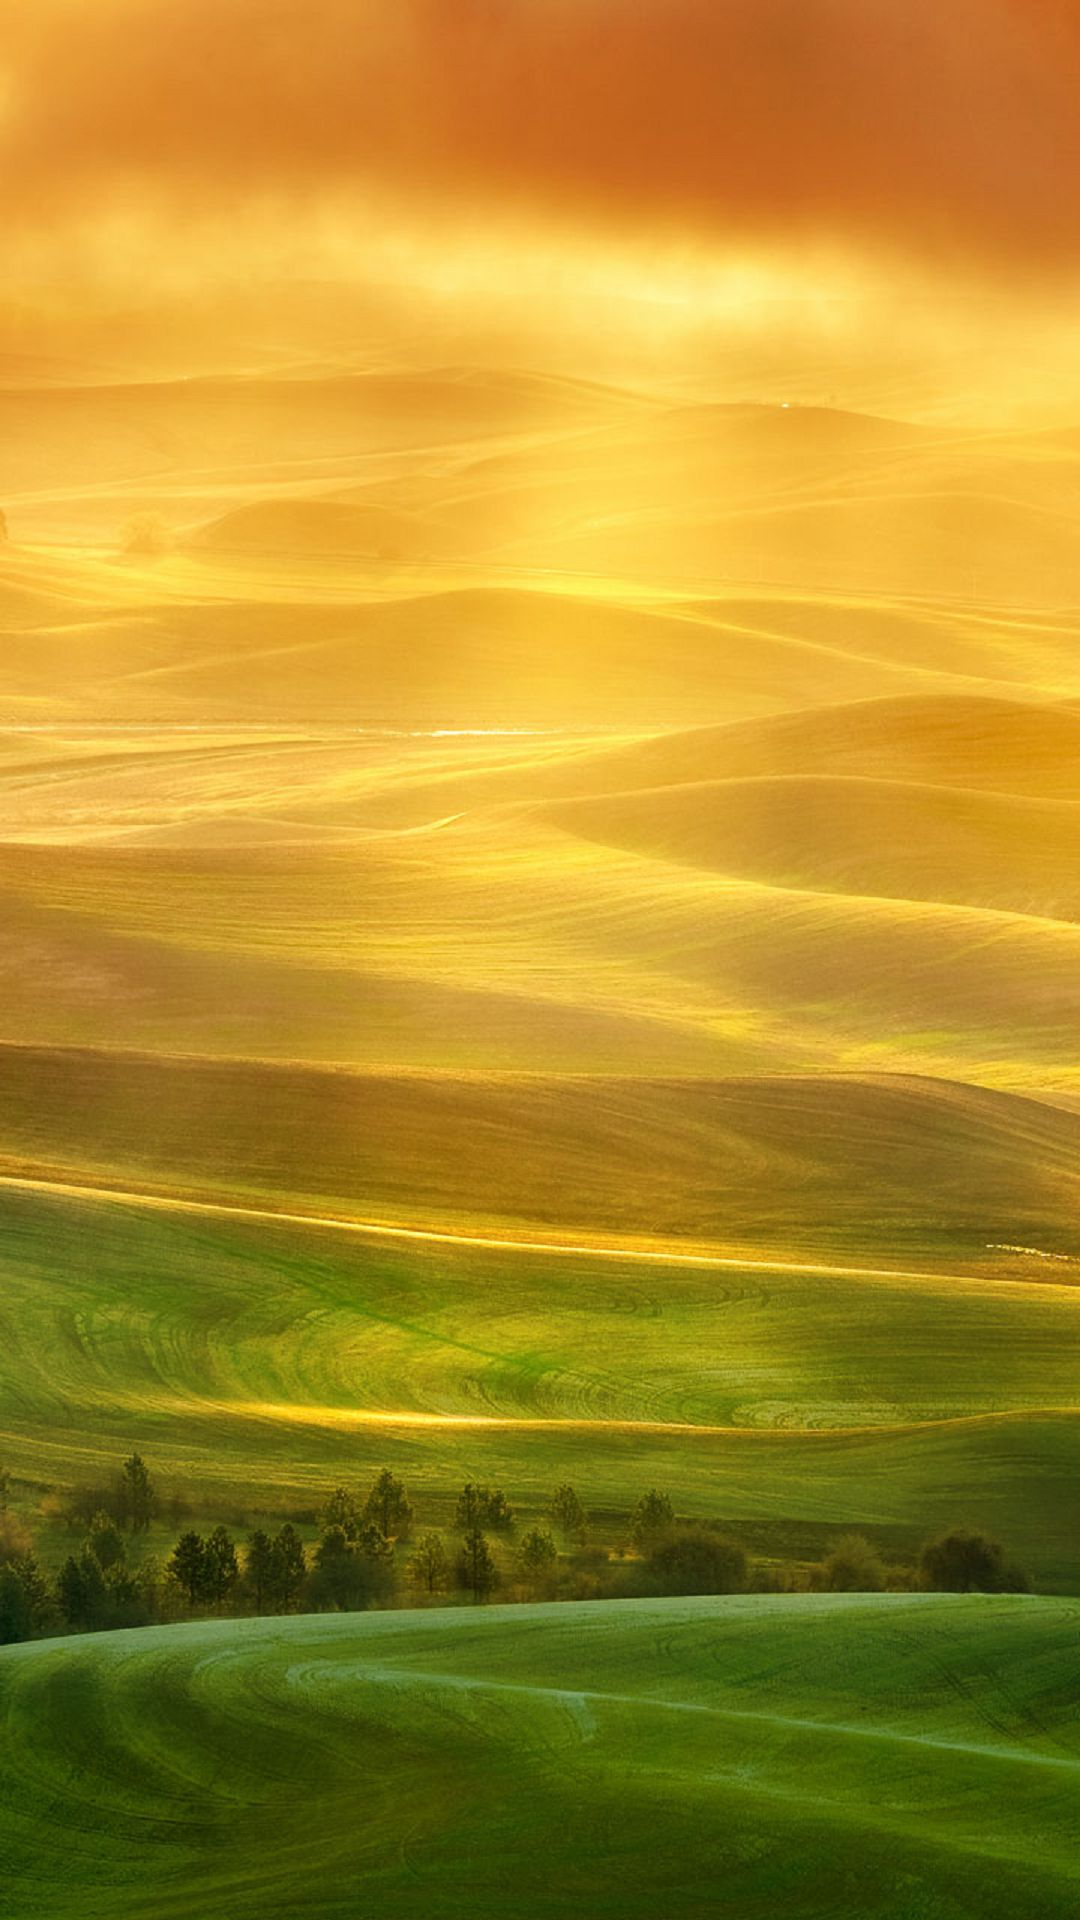 Endless farmland illustration